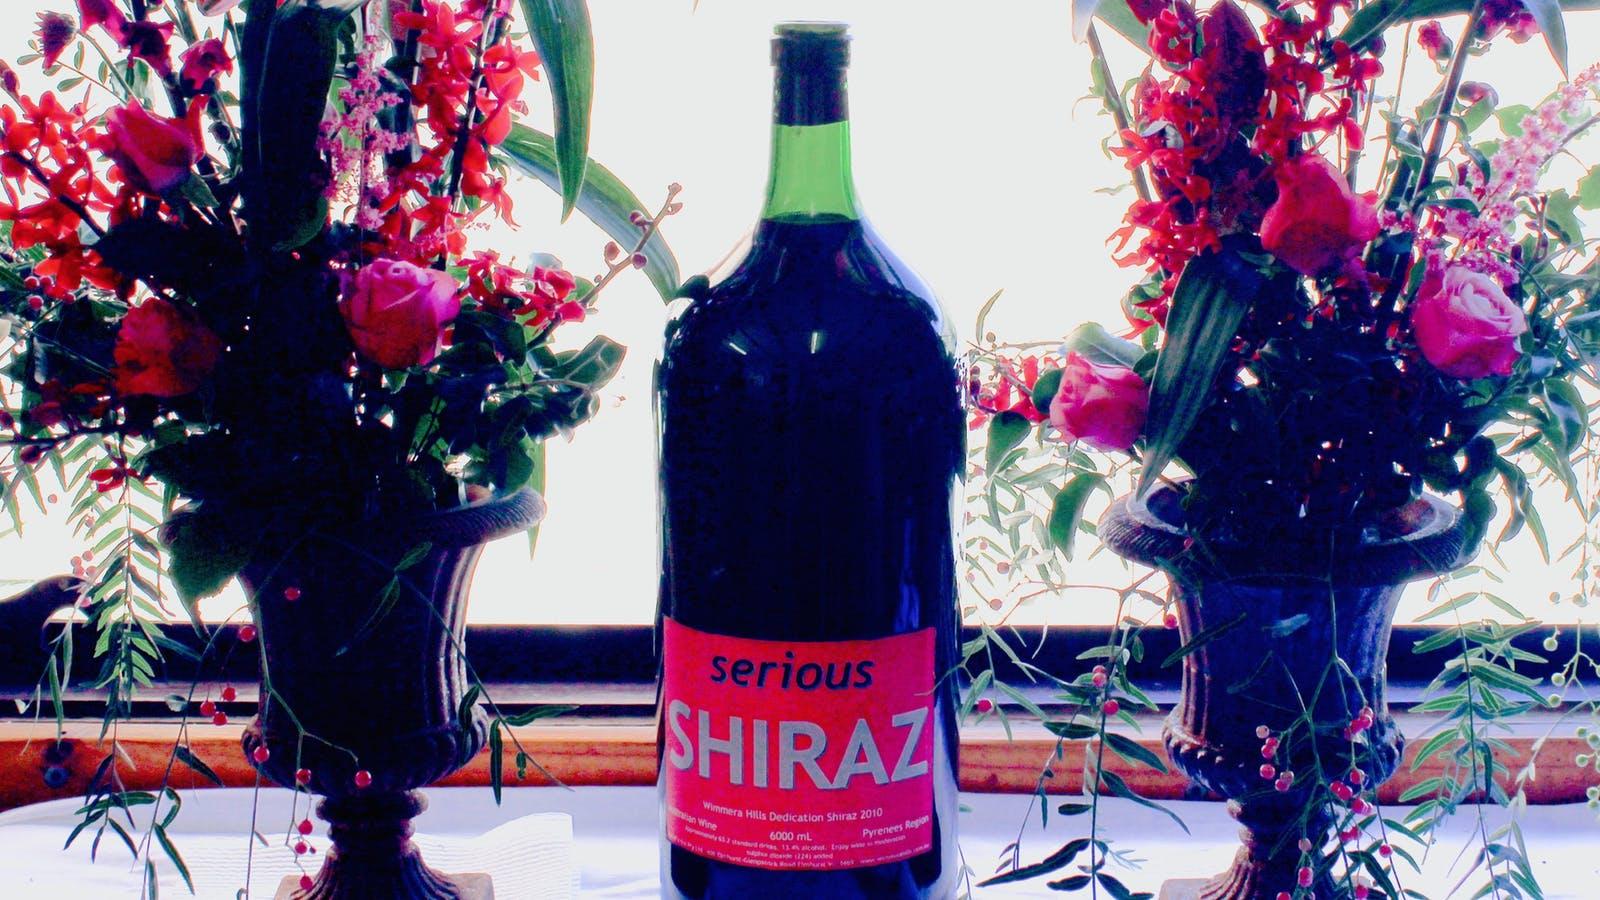 Jeroboam of shiraz - Wimmera Hills Winery